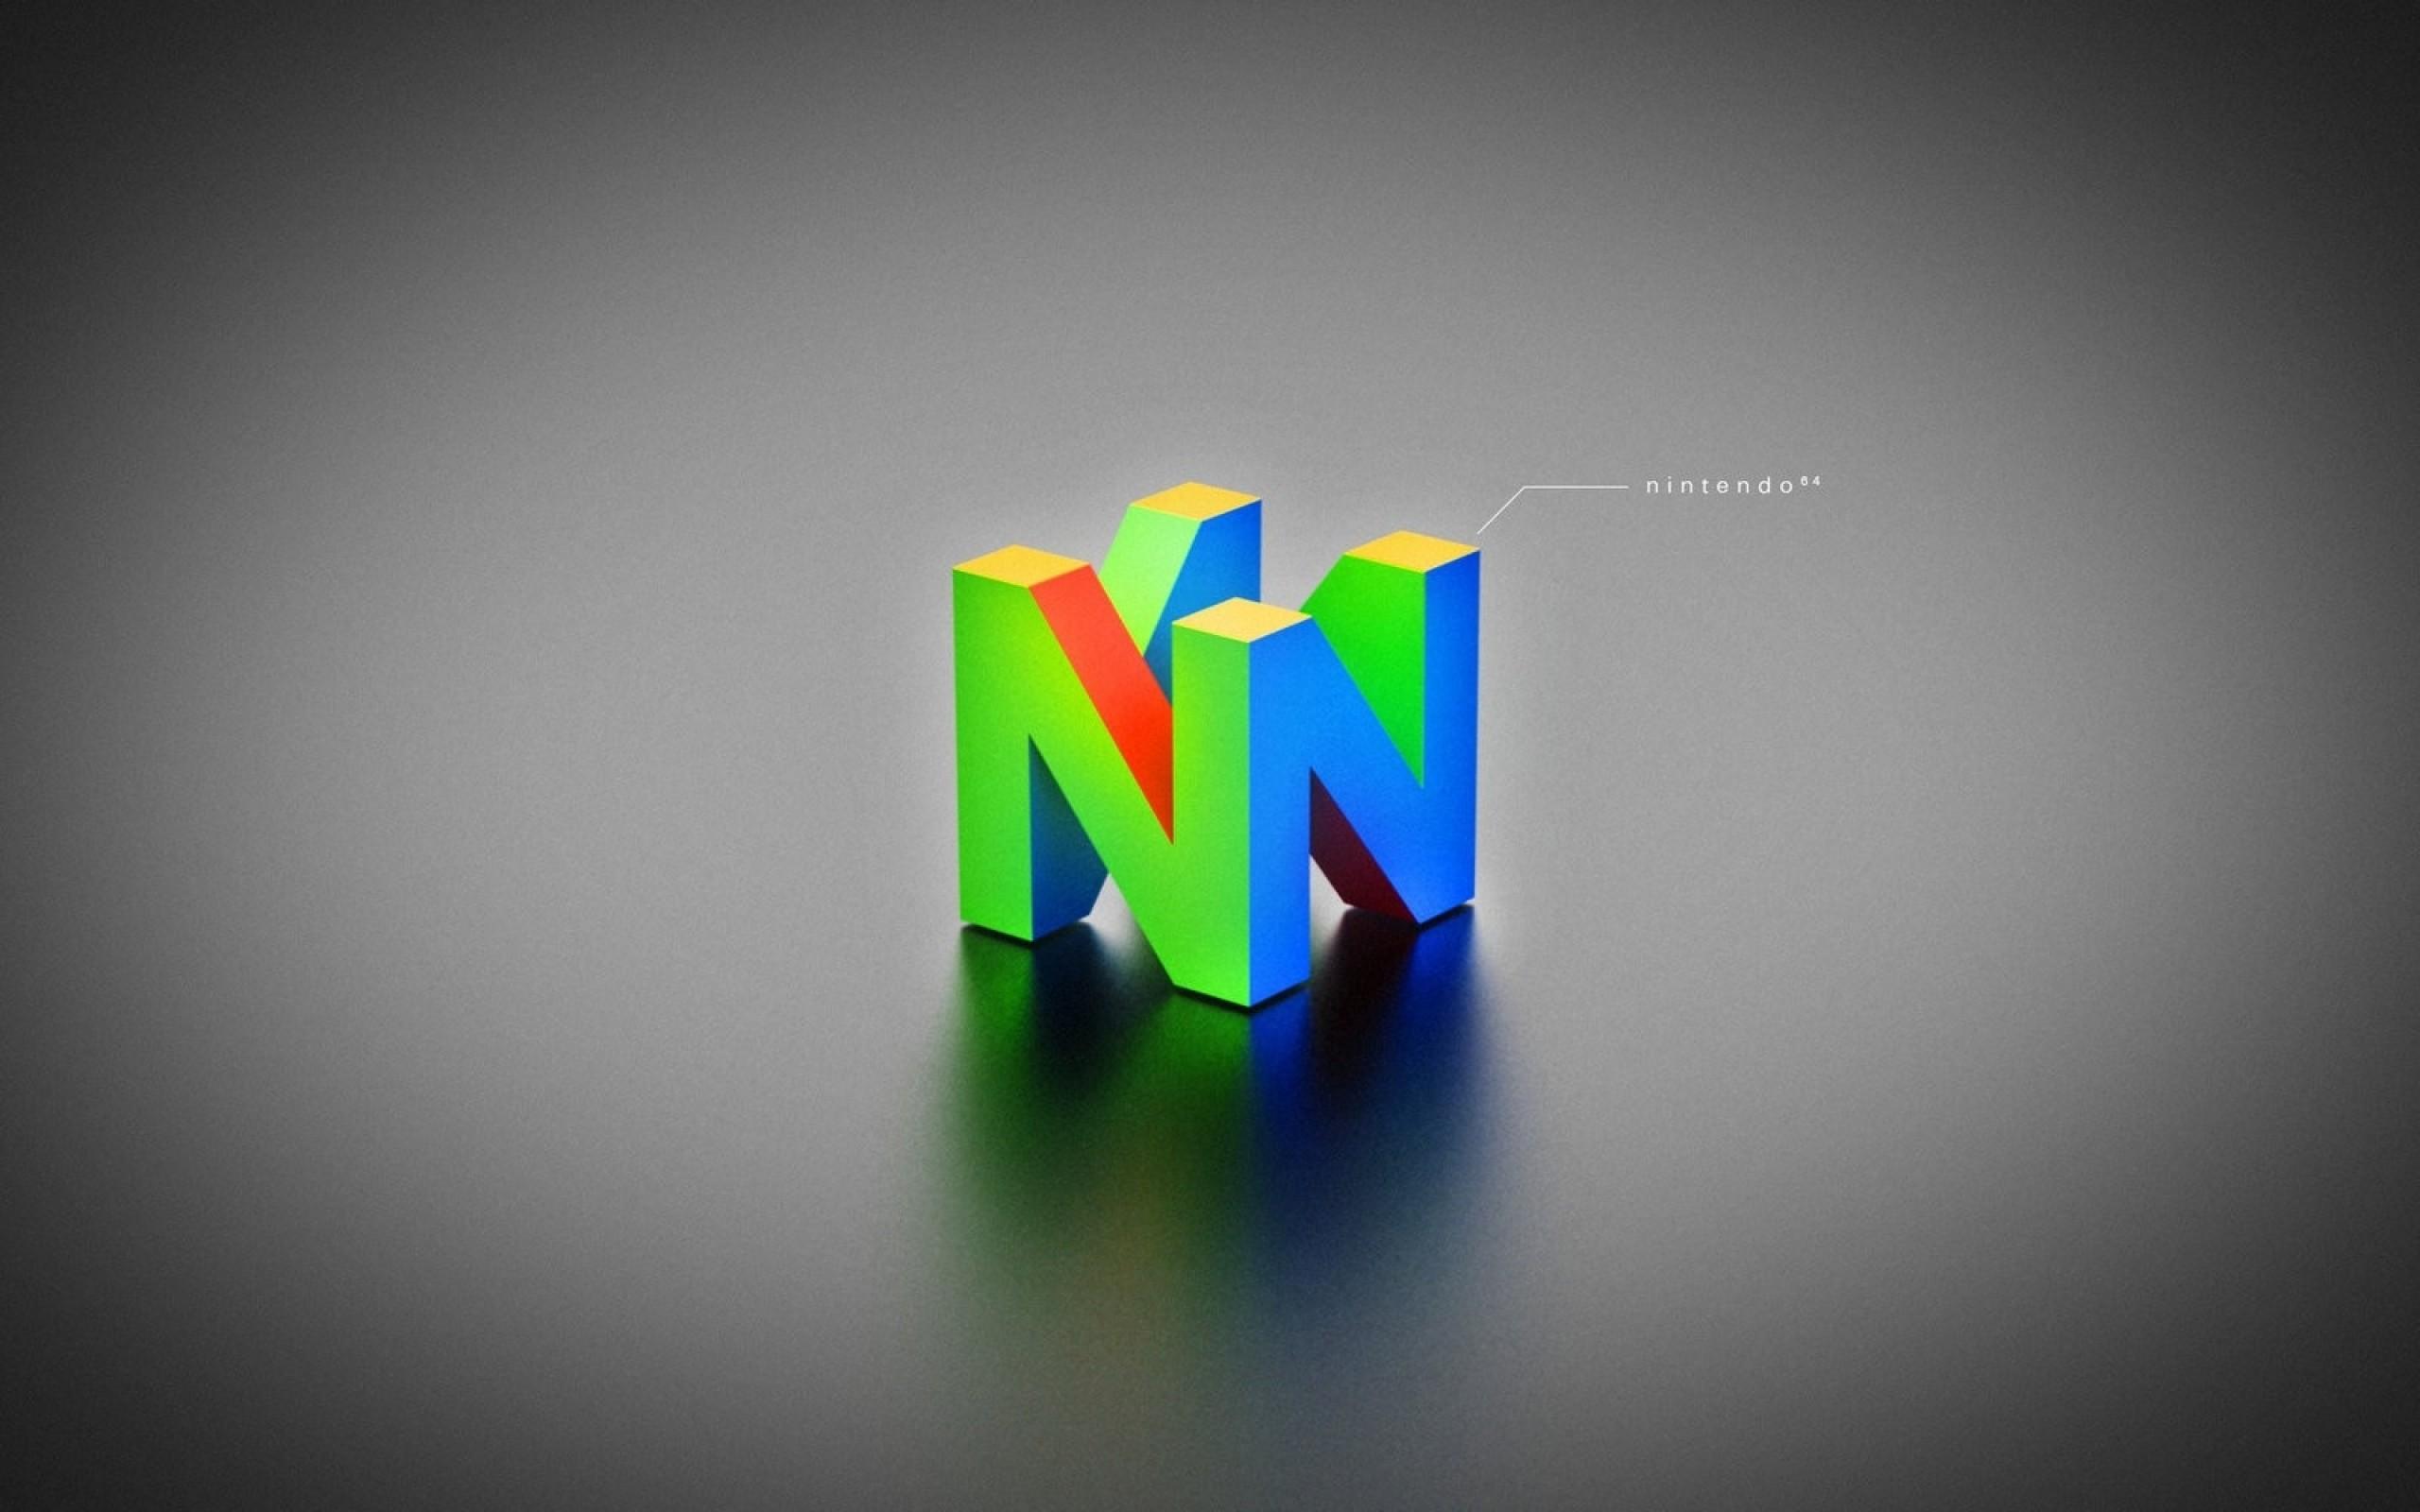 n64 logo hd wallpaper - HD2560×1600